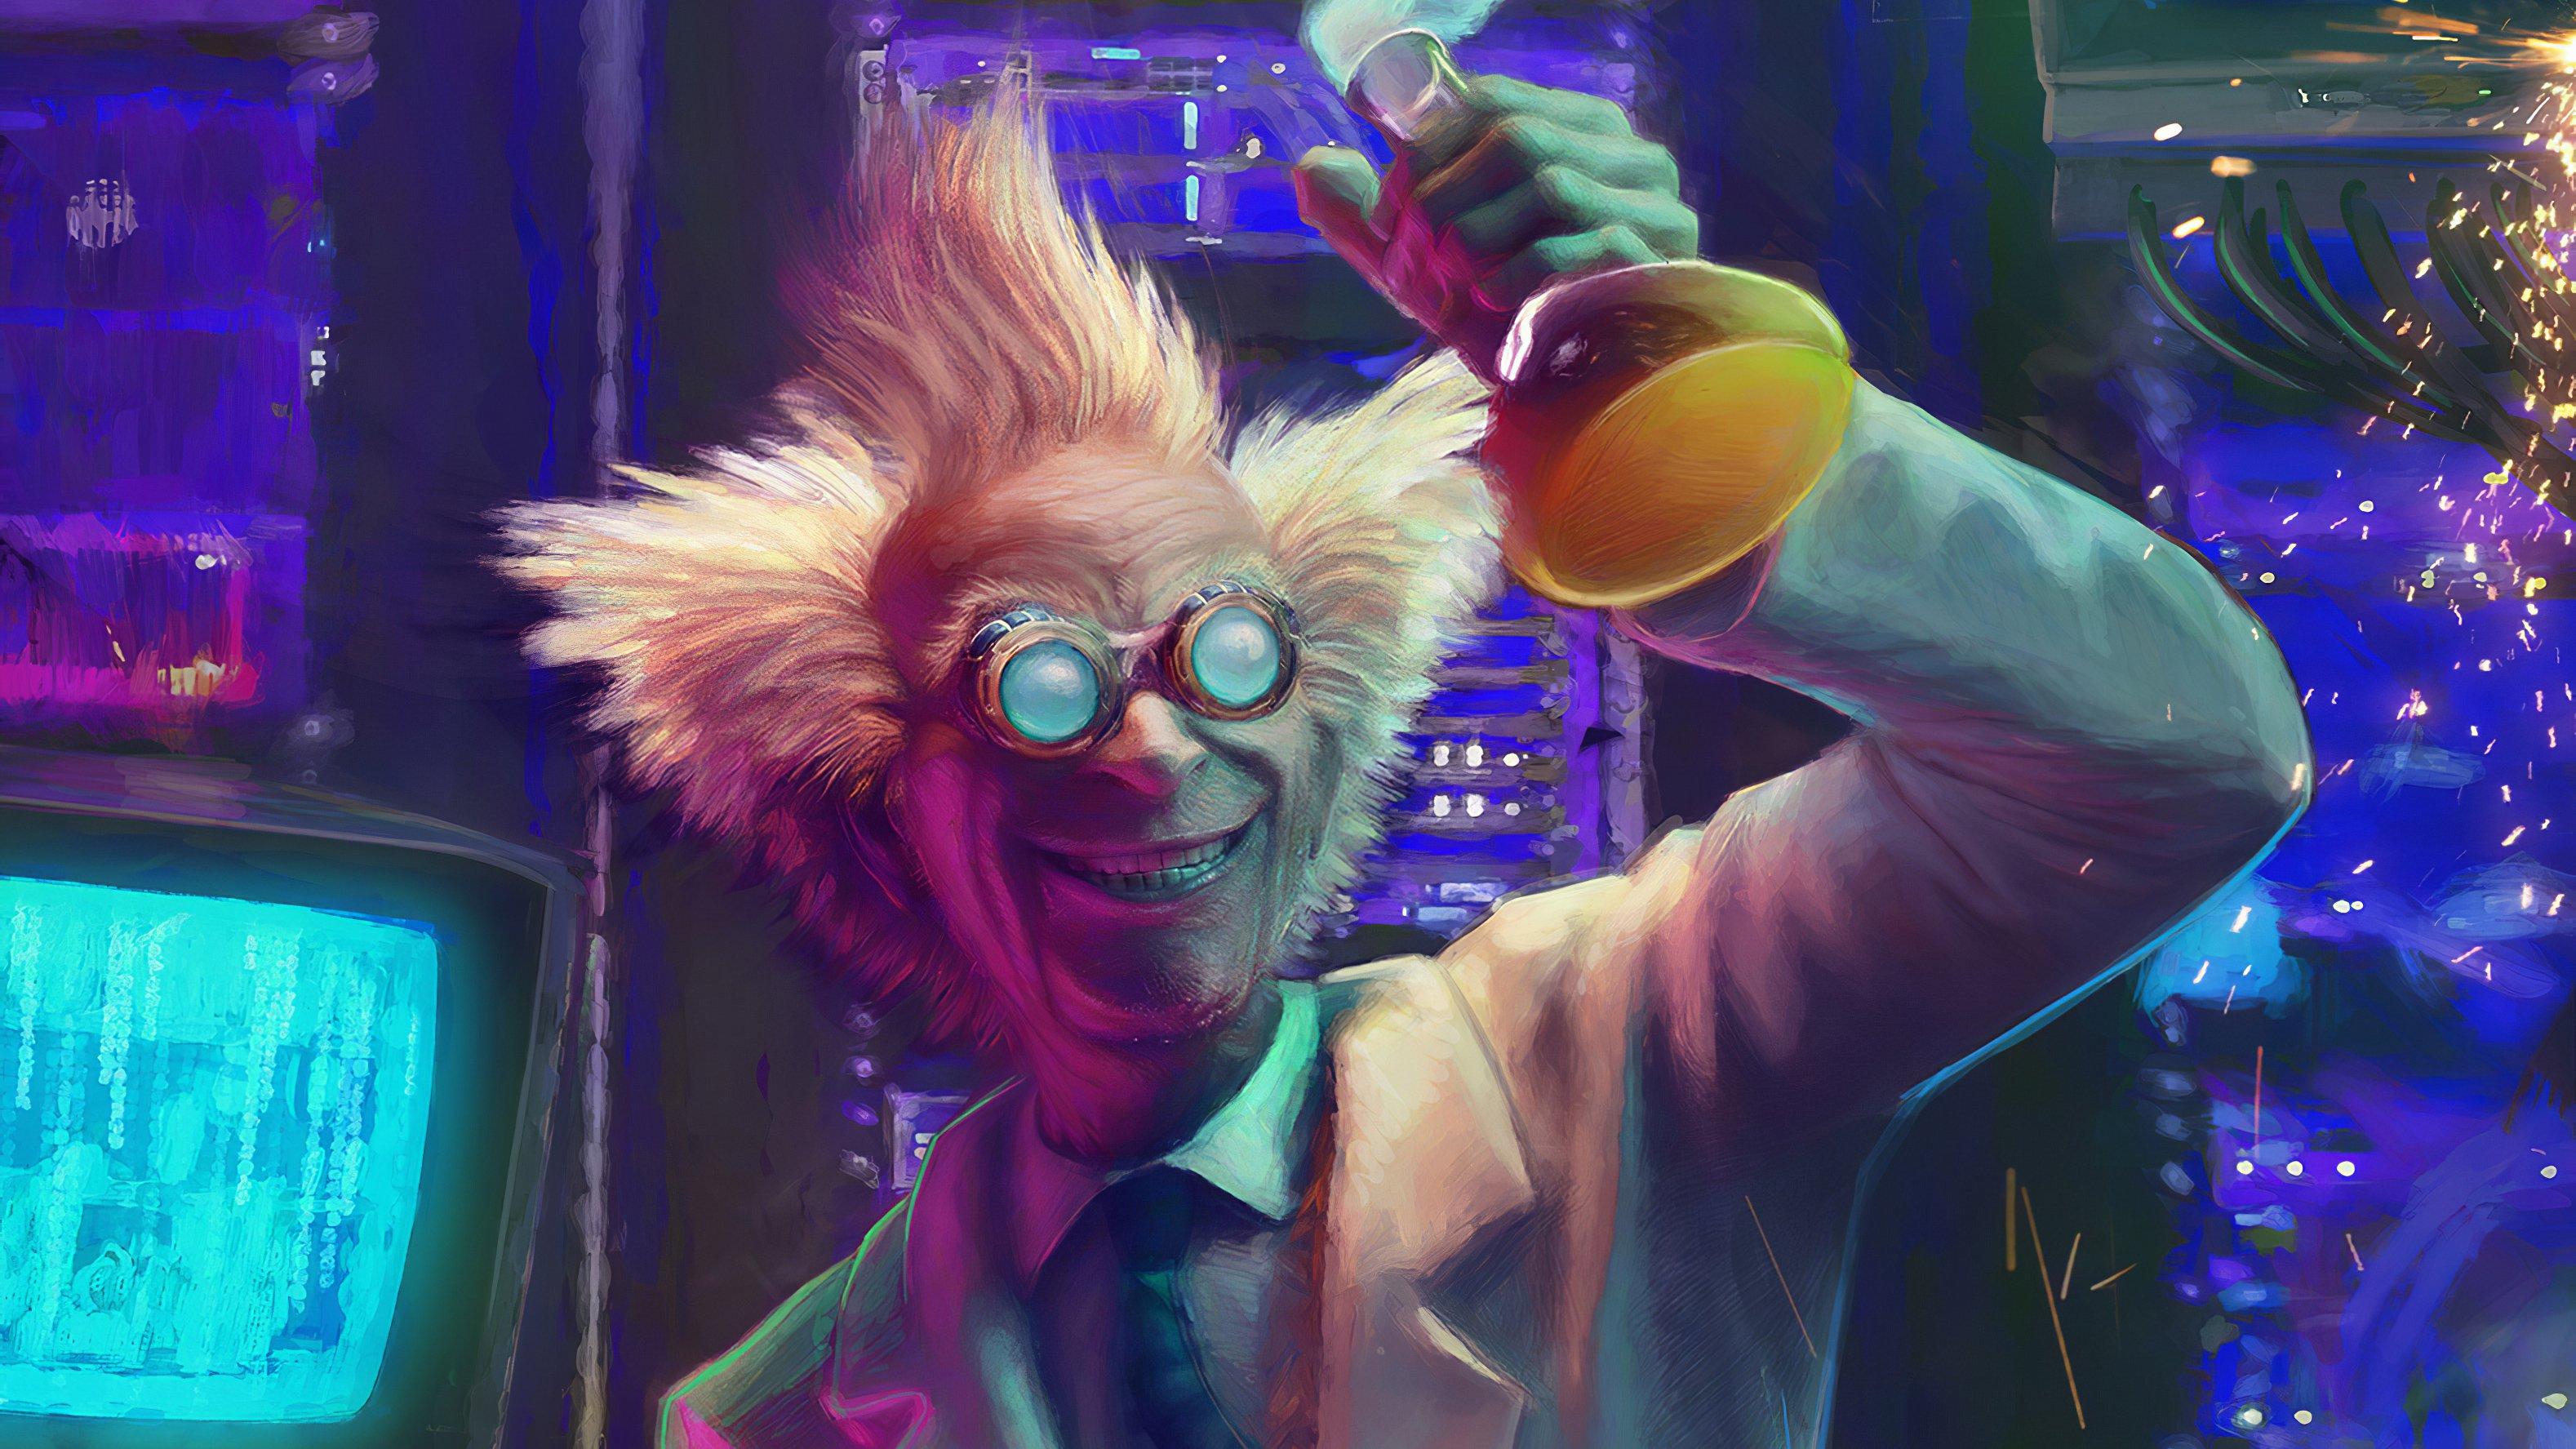 Wallpaper Mad scientist